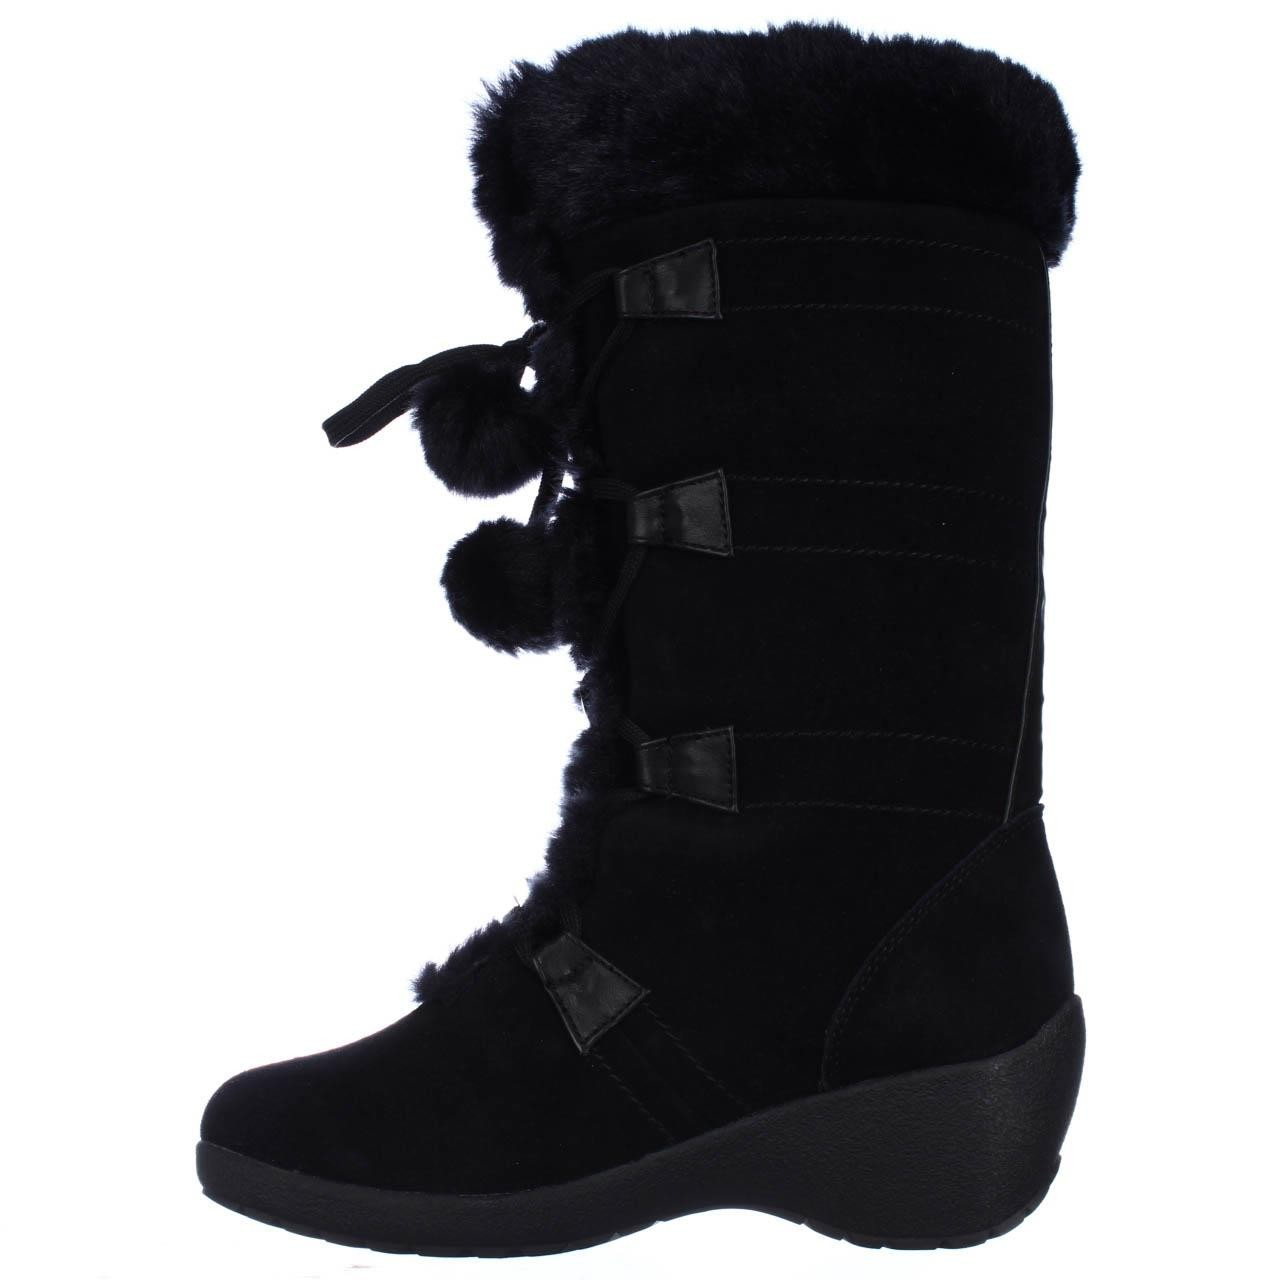 Sporto Megan Wedge Lace Up Waterproof Winter Boots In